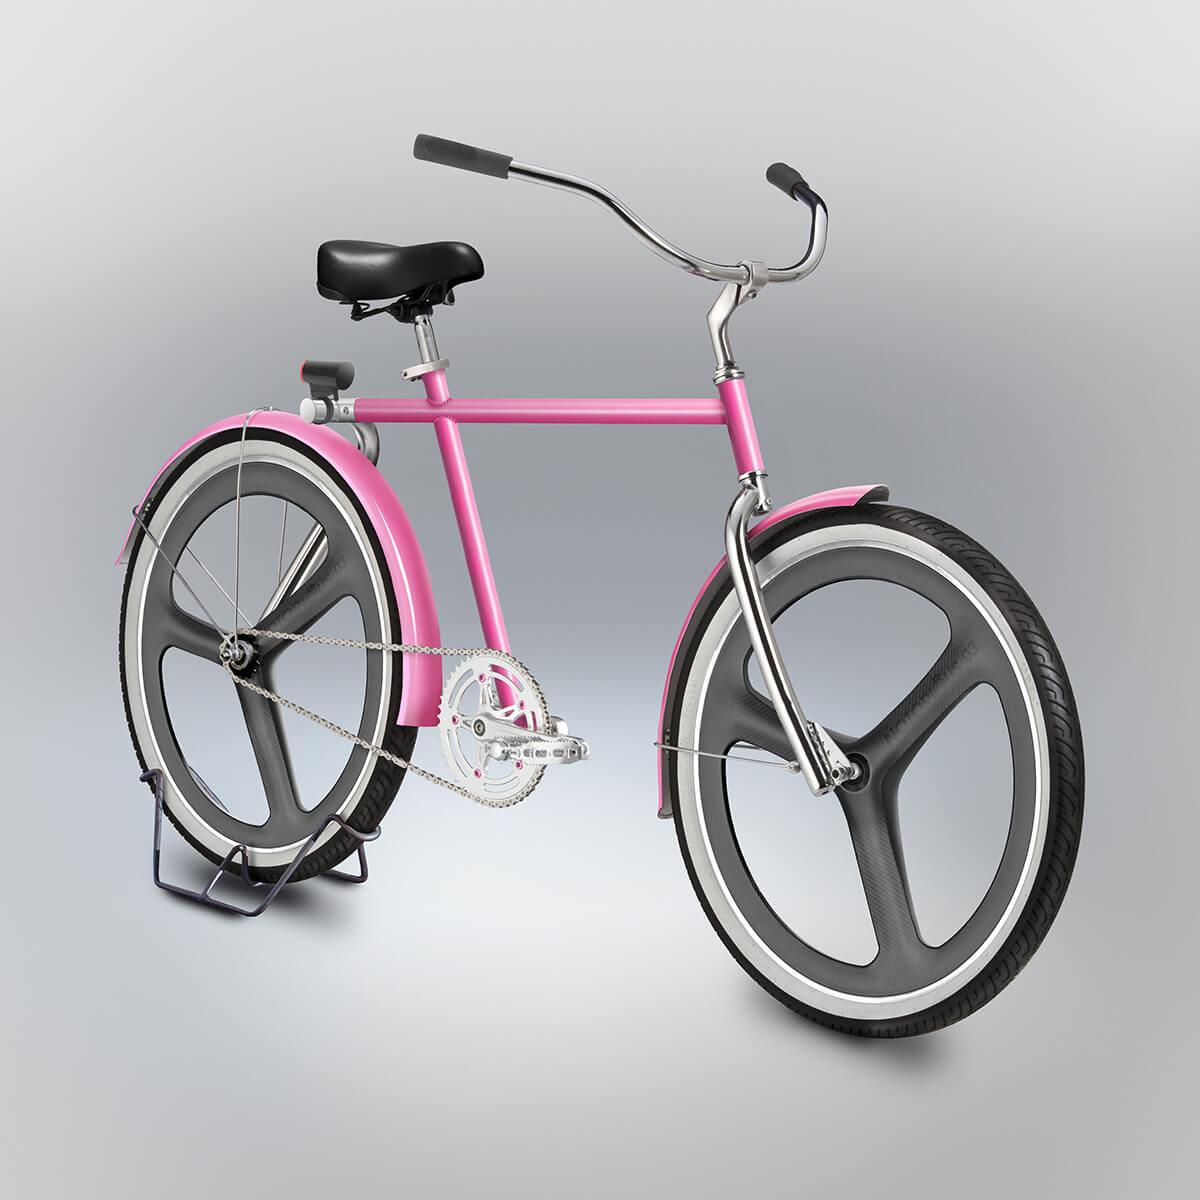 gianluca-gimini-bikes-22